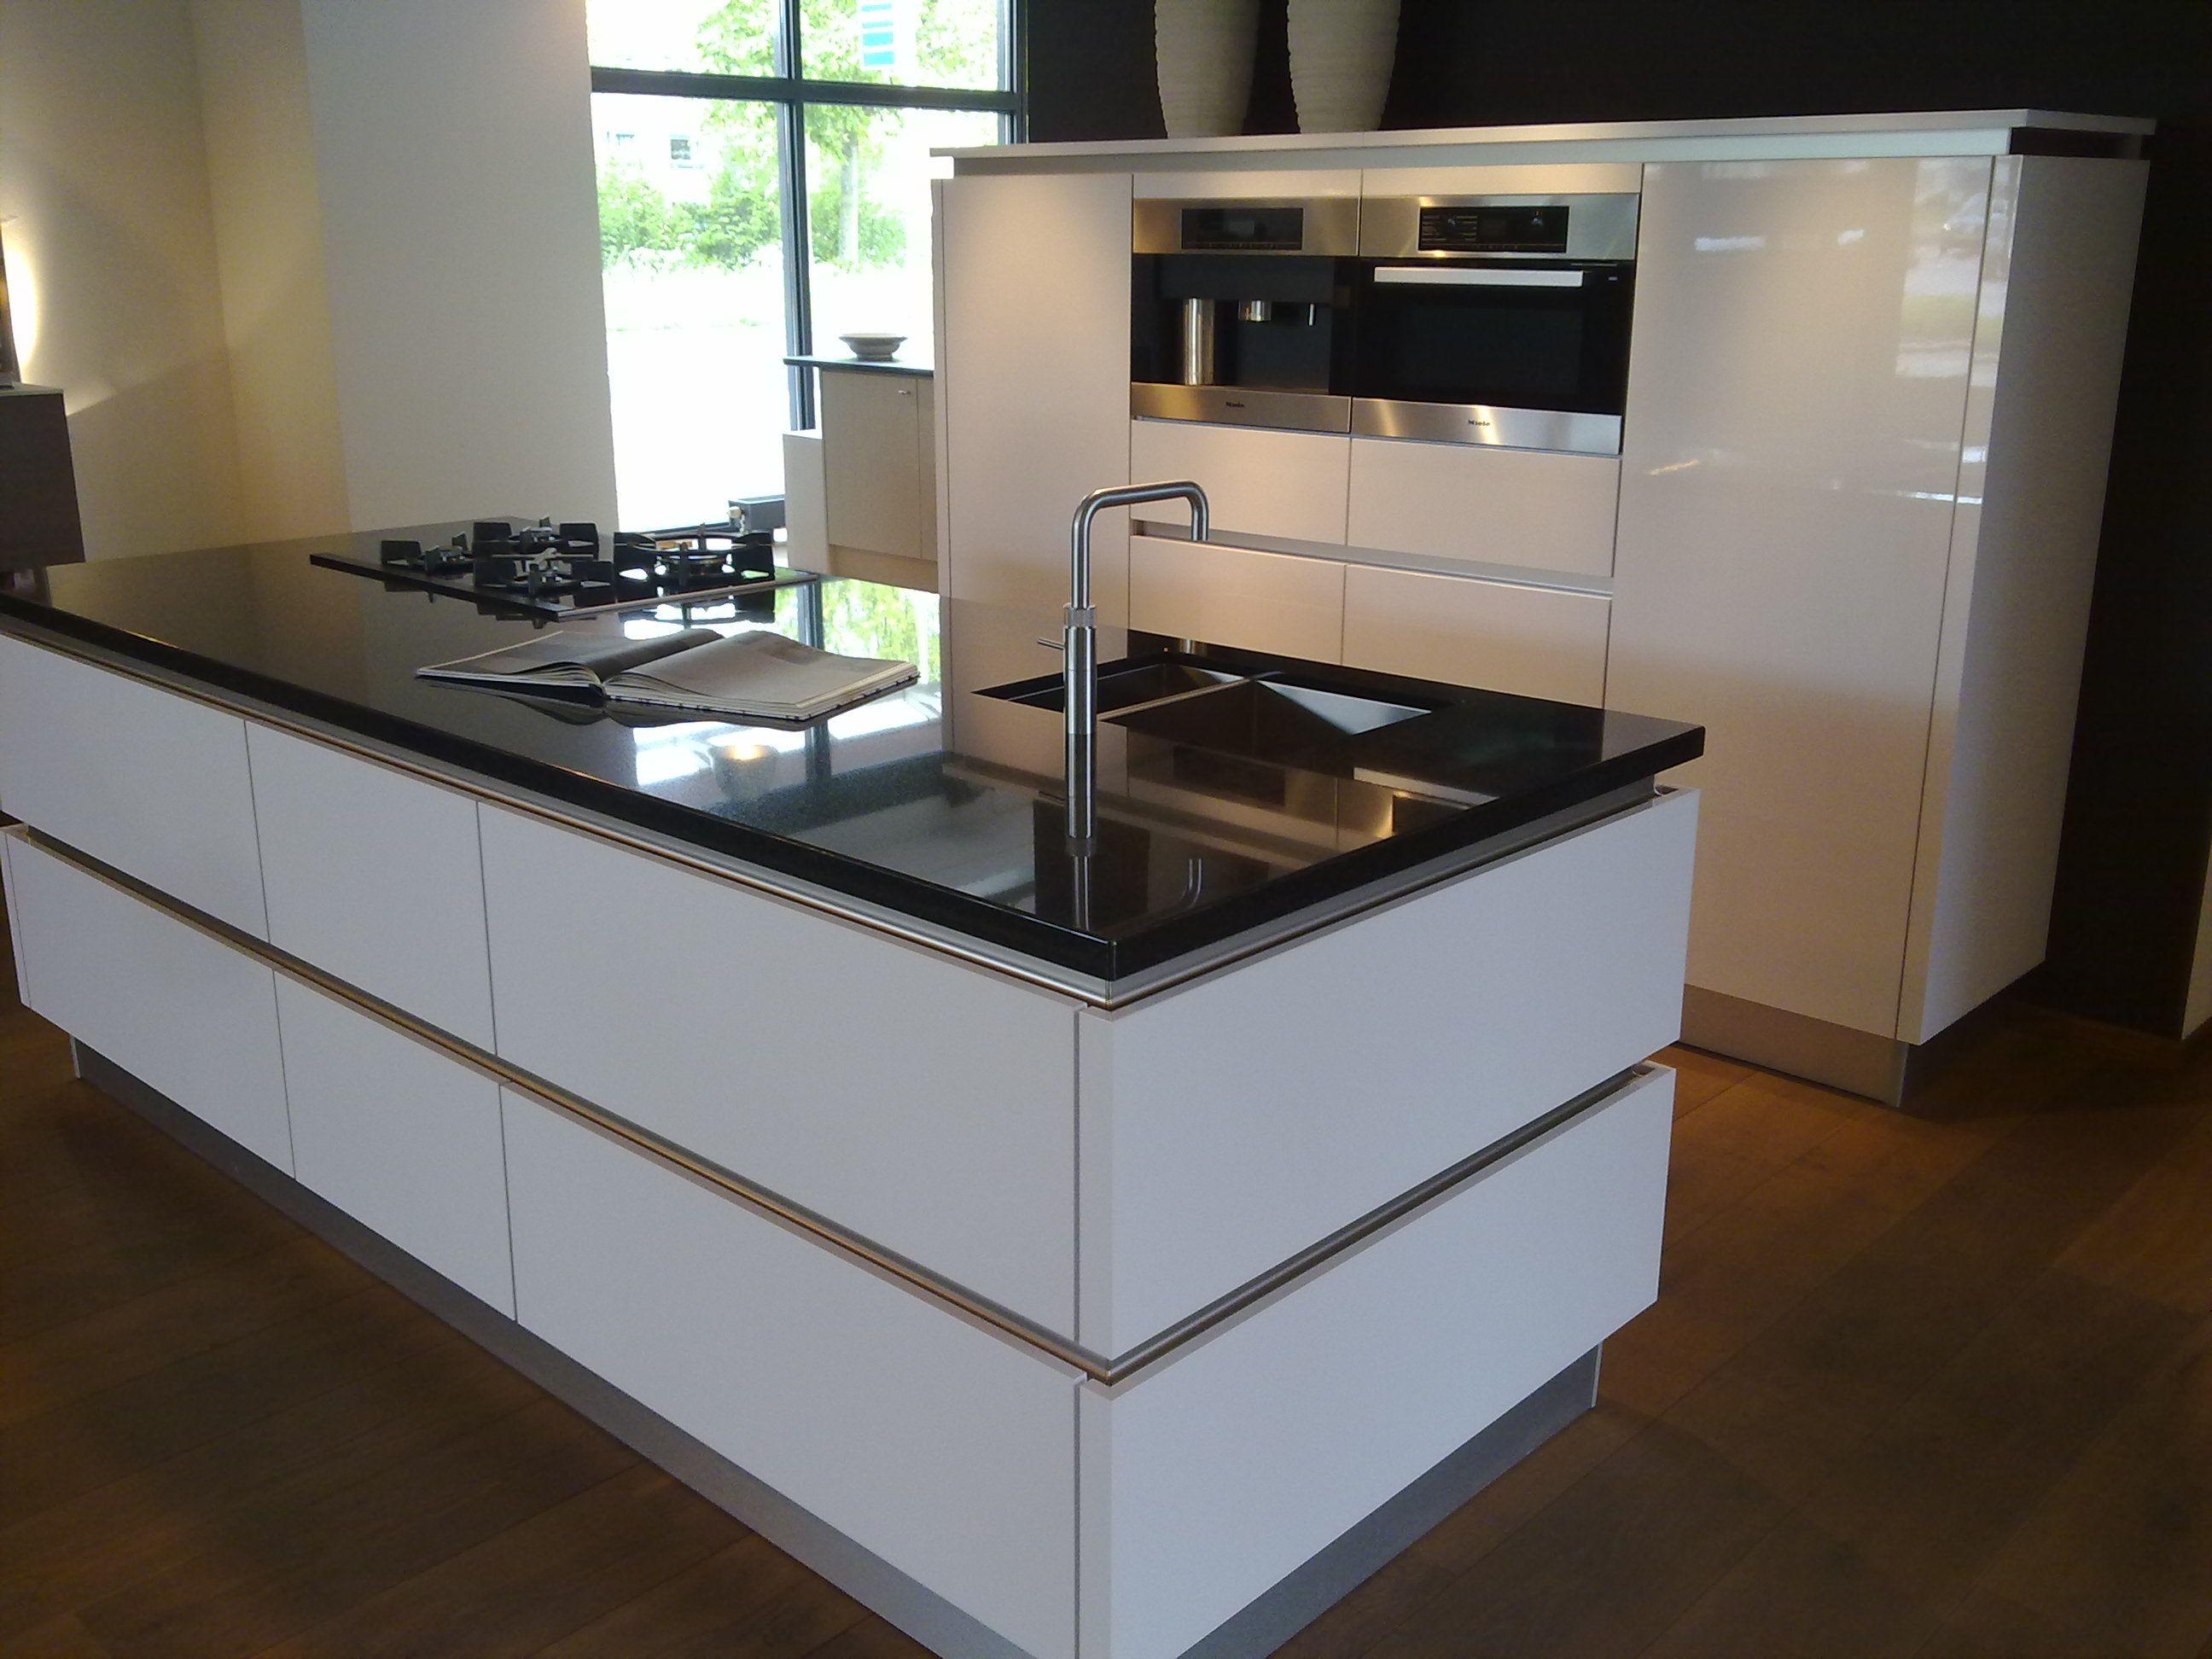 Keukenprijs altijd de beste keukenprijs keller greeploze hoogglans keuken 54220 - Model keuken ...